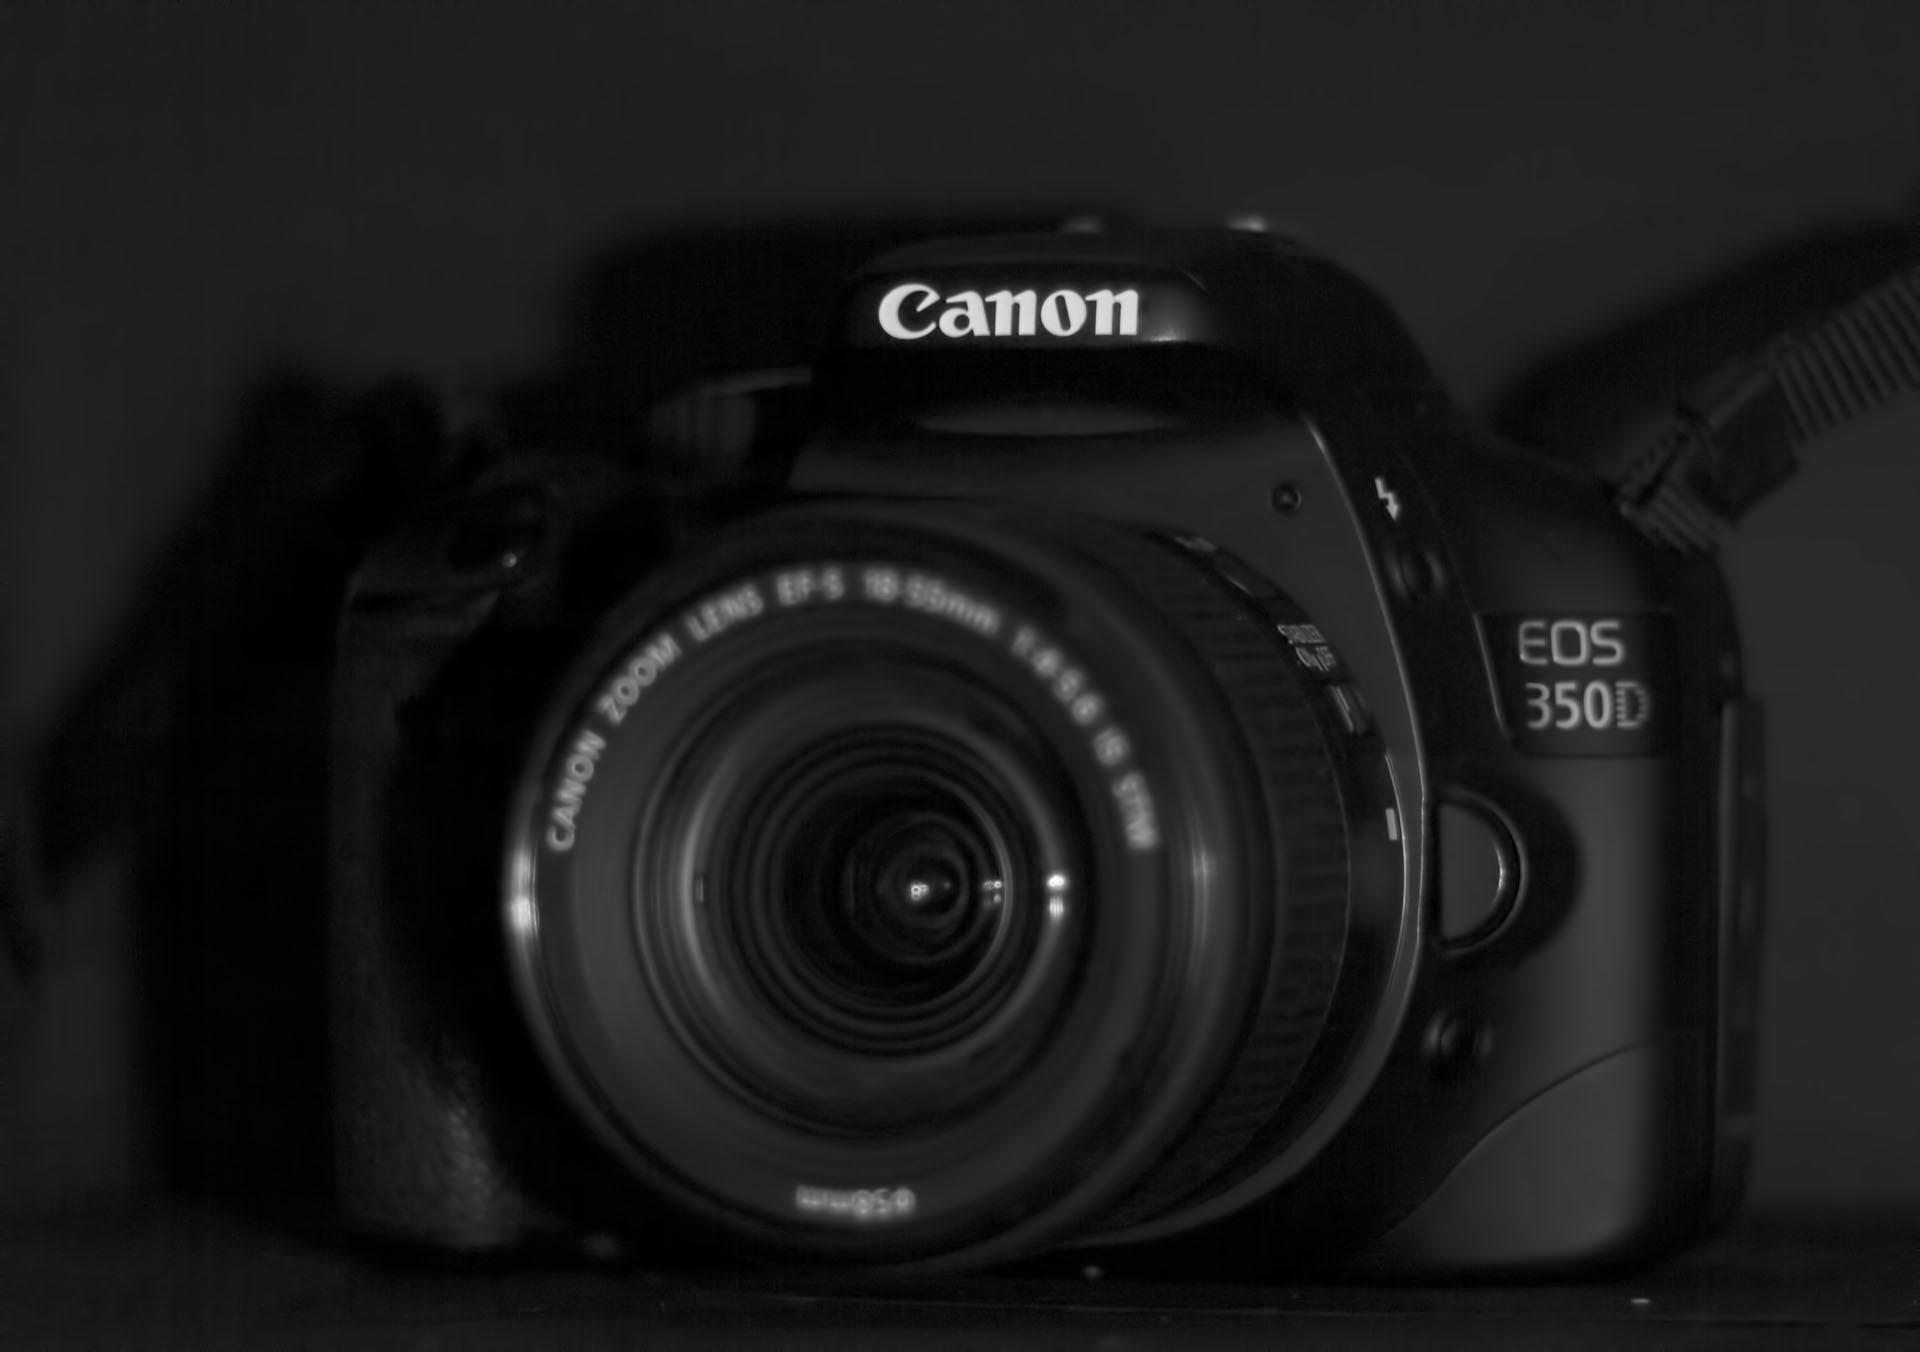 Canon 350D DSLR camera